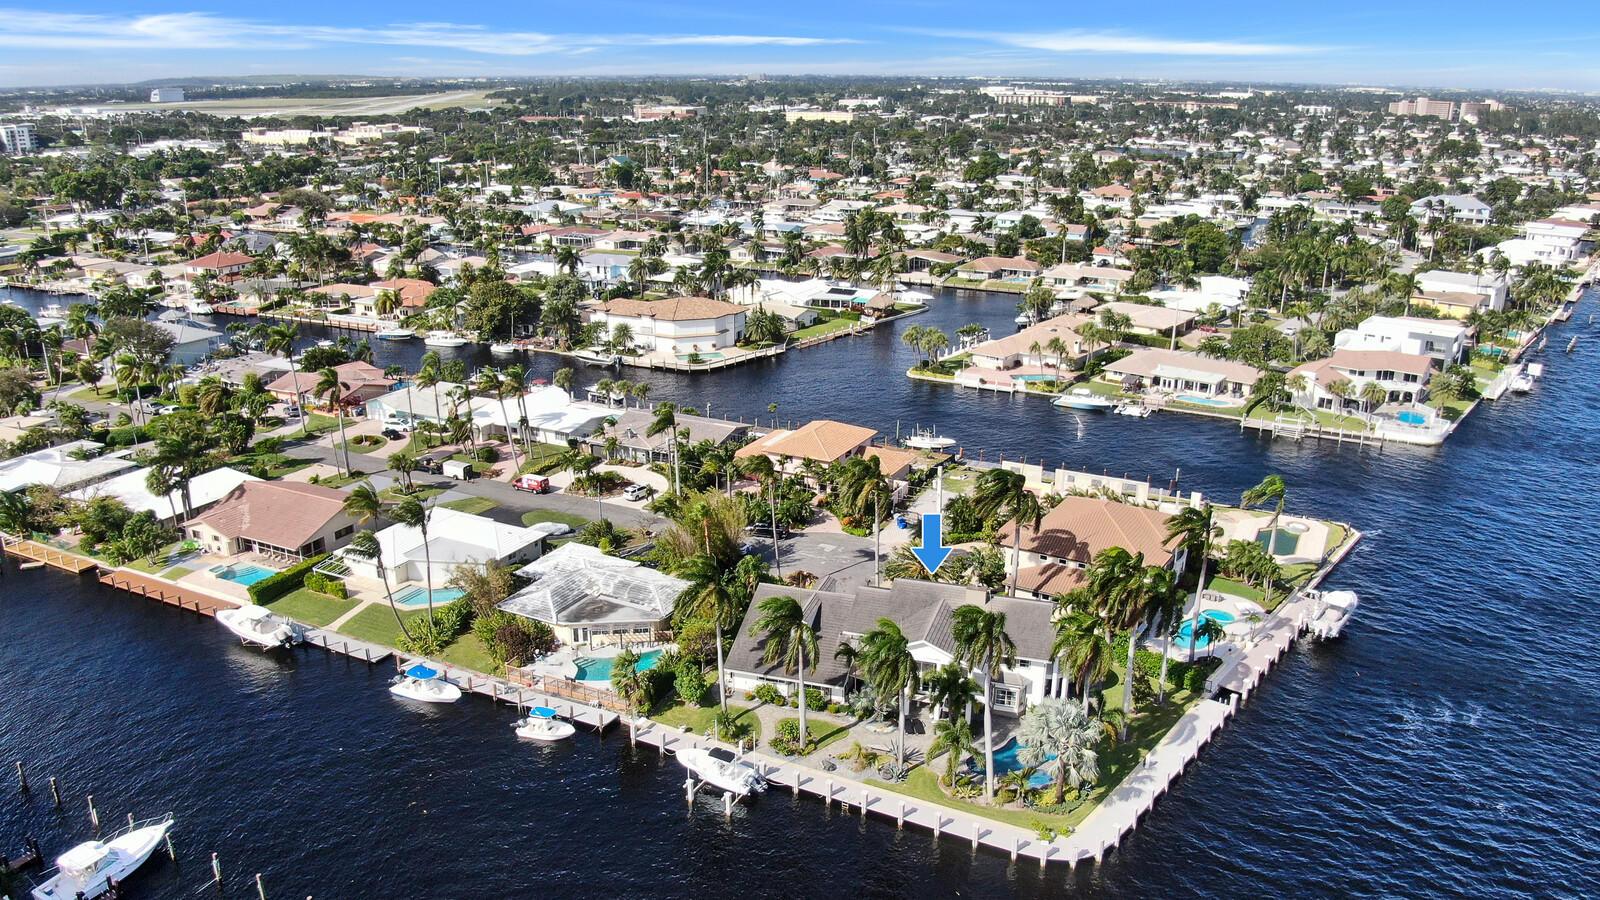 Harbor Village, 2782 NE 3rd, Pompano Beach, Florida 33062